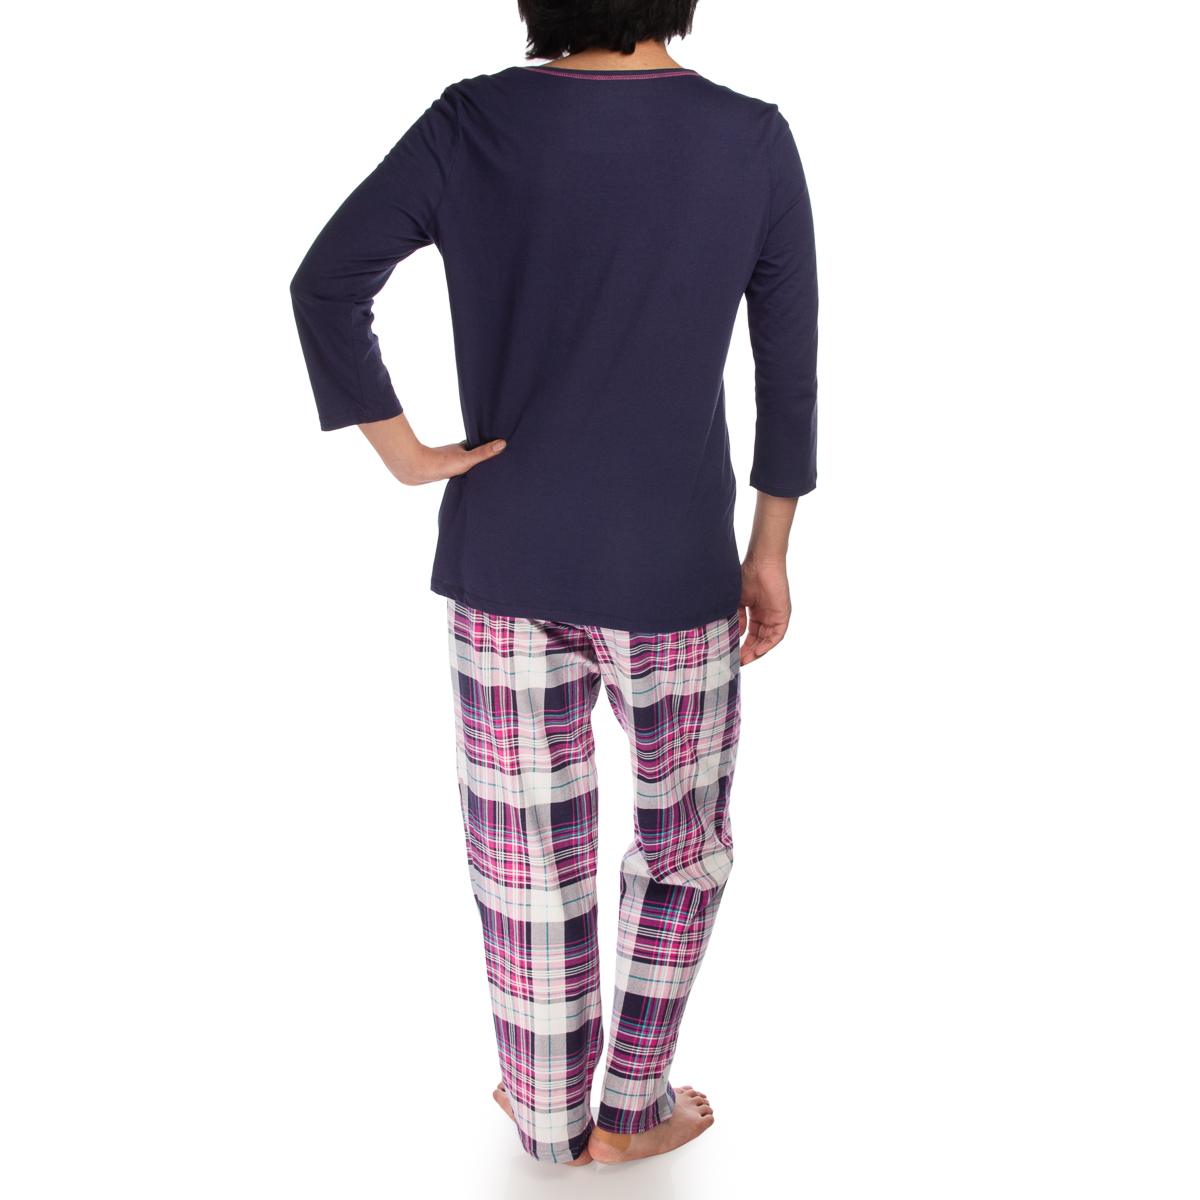 2-Piece-Jockey-Soft-Cotton-Pajamas-For-Women-Set-Top-Bottom-PJs-Sleepwear thumbnail 10